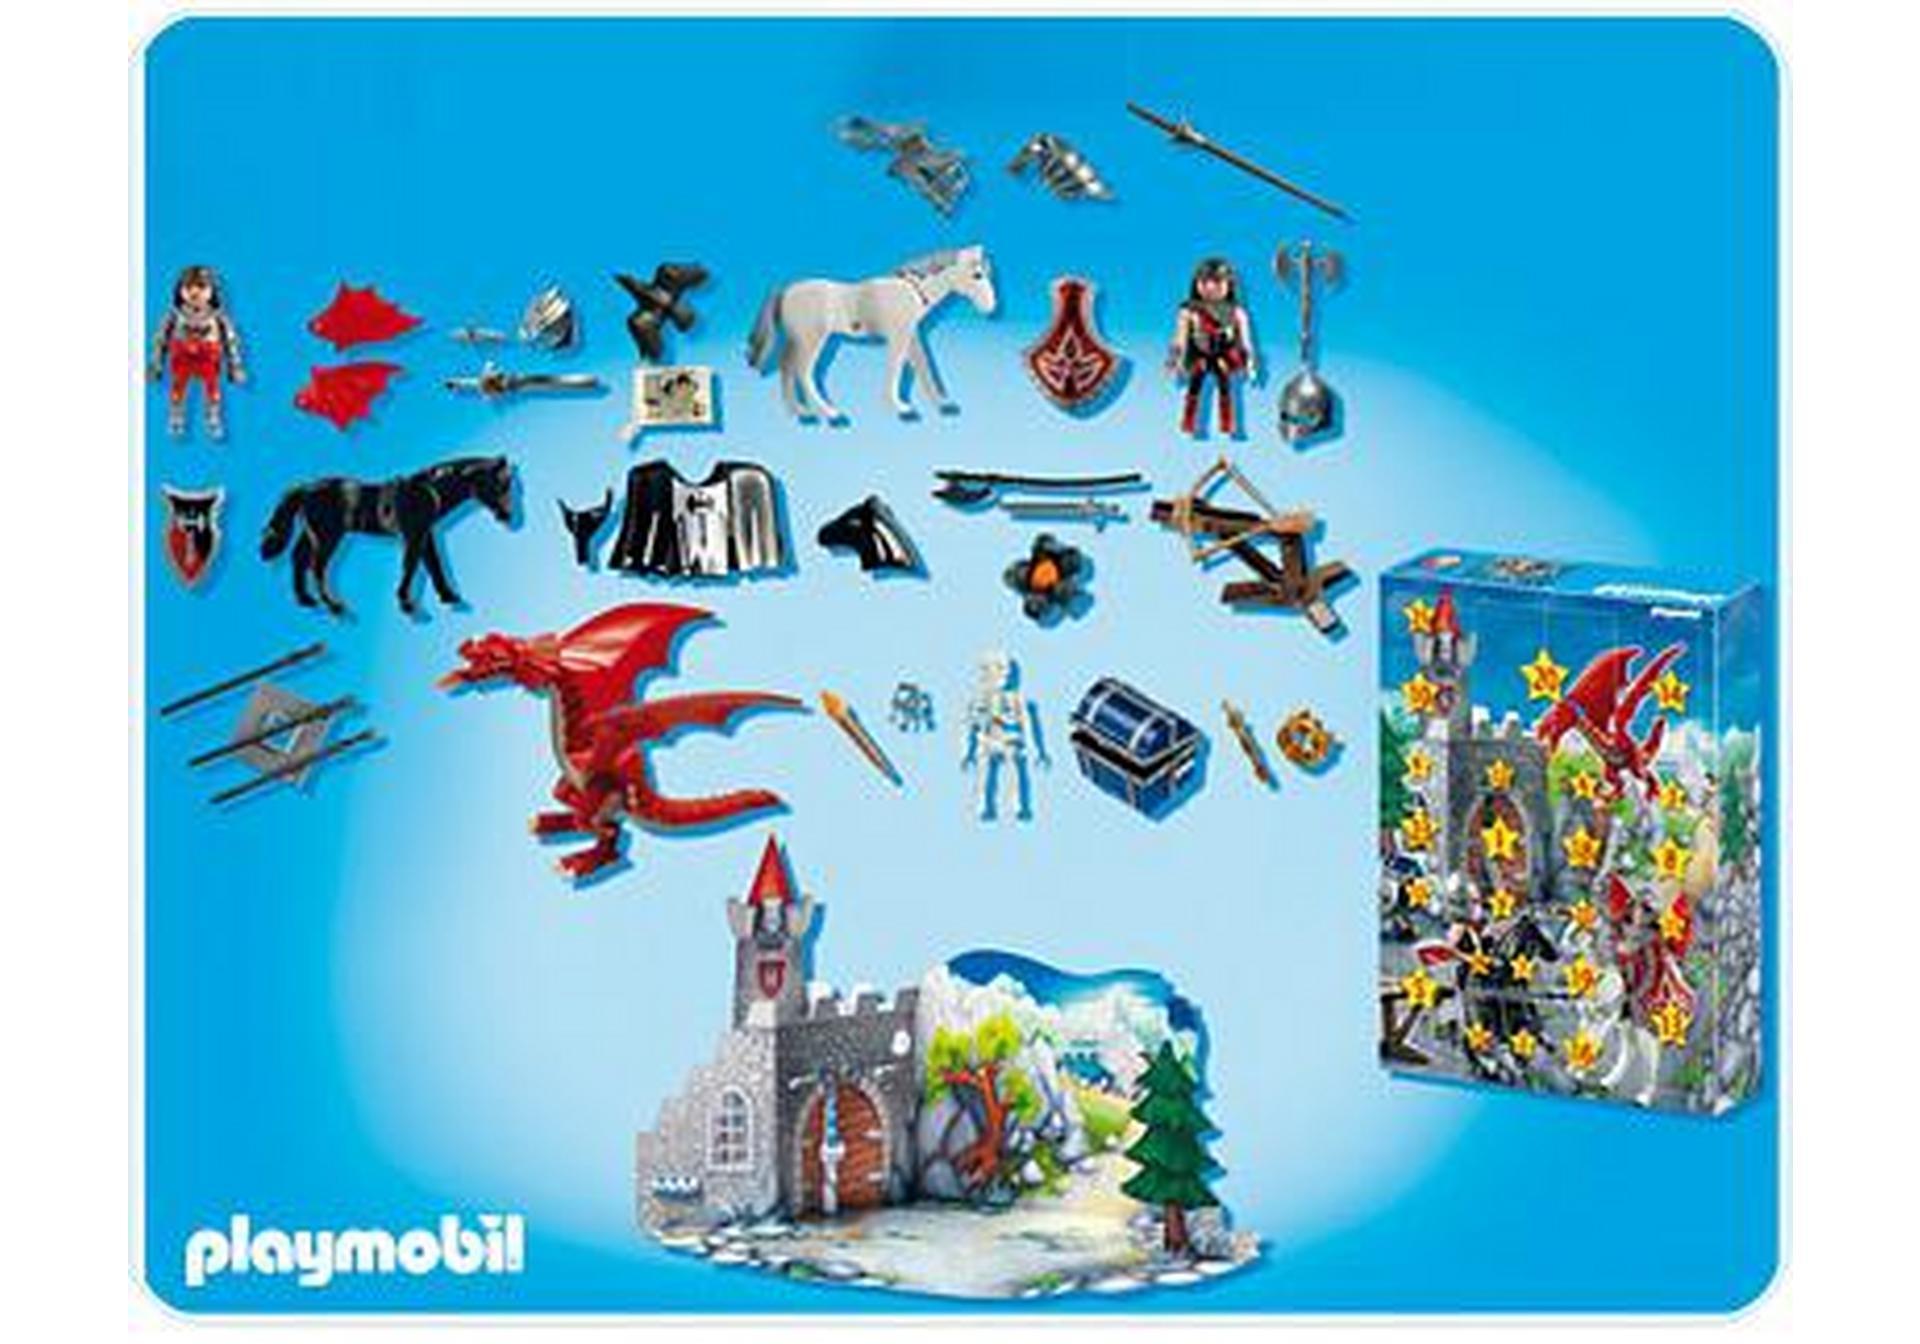 adventskalender drachenland 4160 a playmobil deutschland. Black Bedroom Furniture Sets. Home Design Ideas